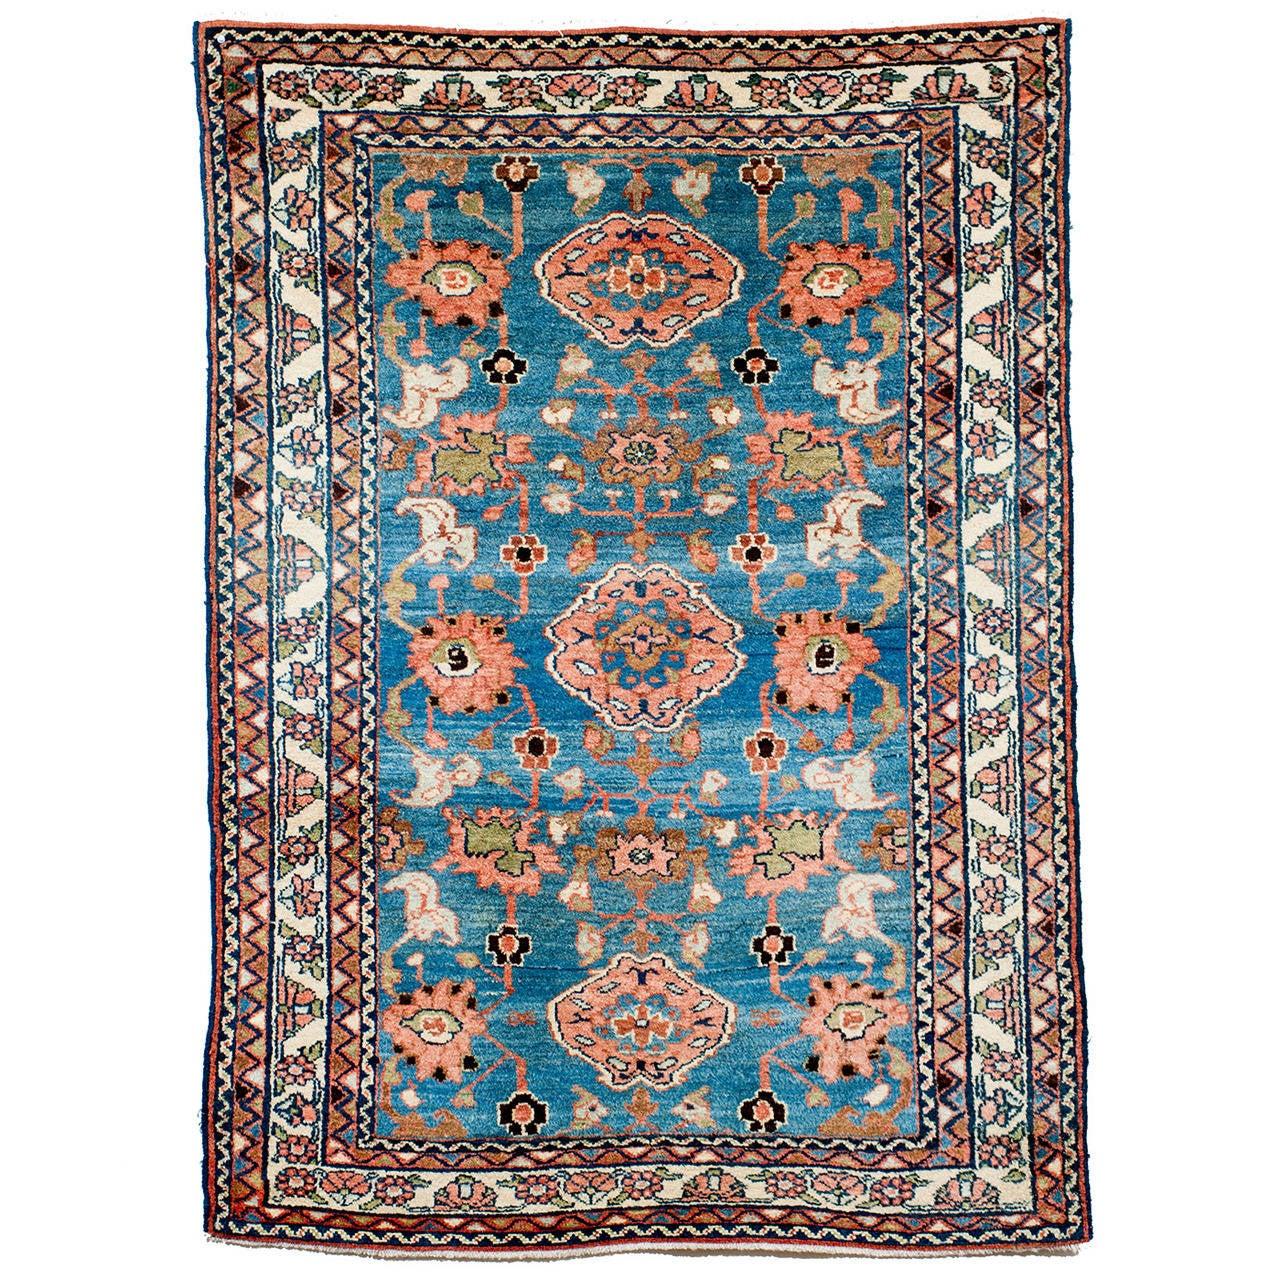 Antique Northwest Persian Rug in Excellent Condition